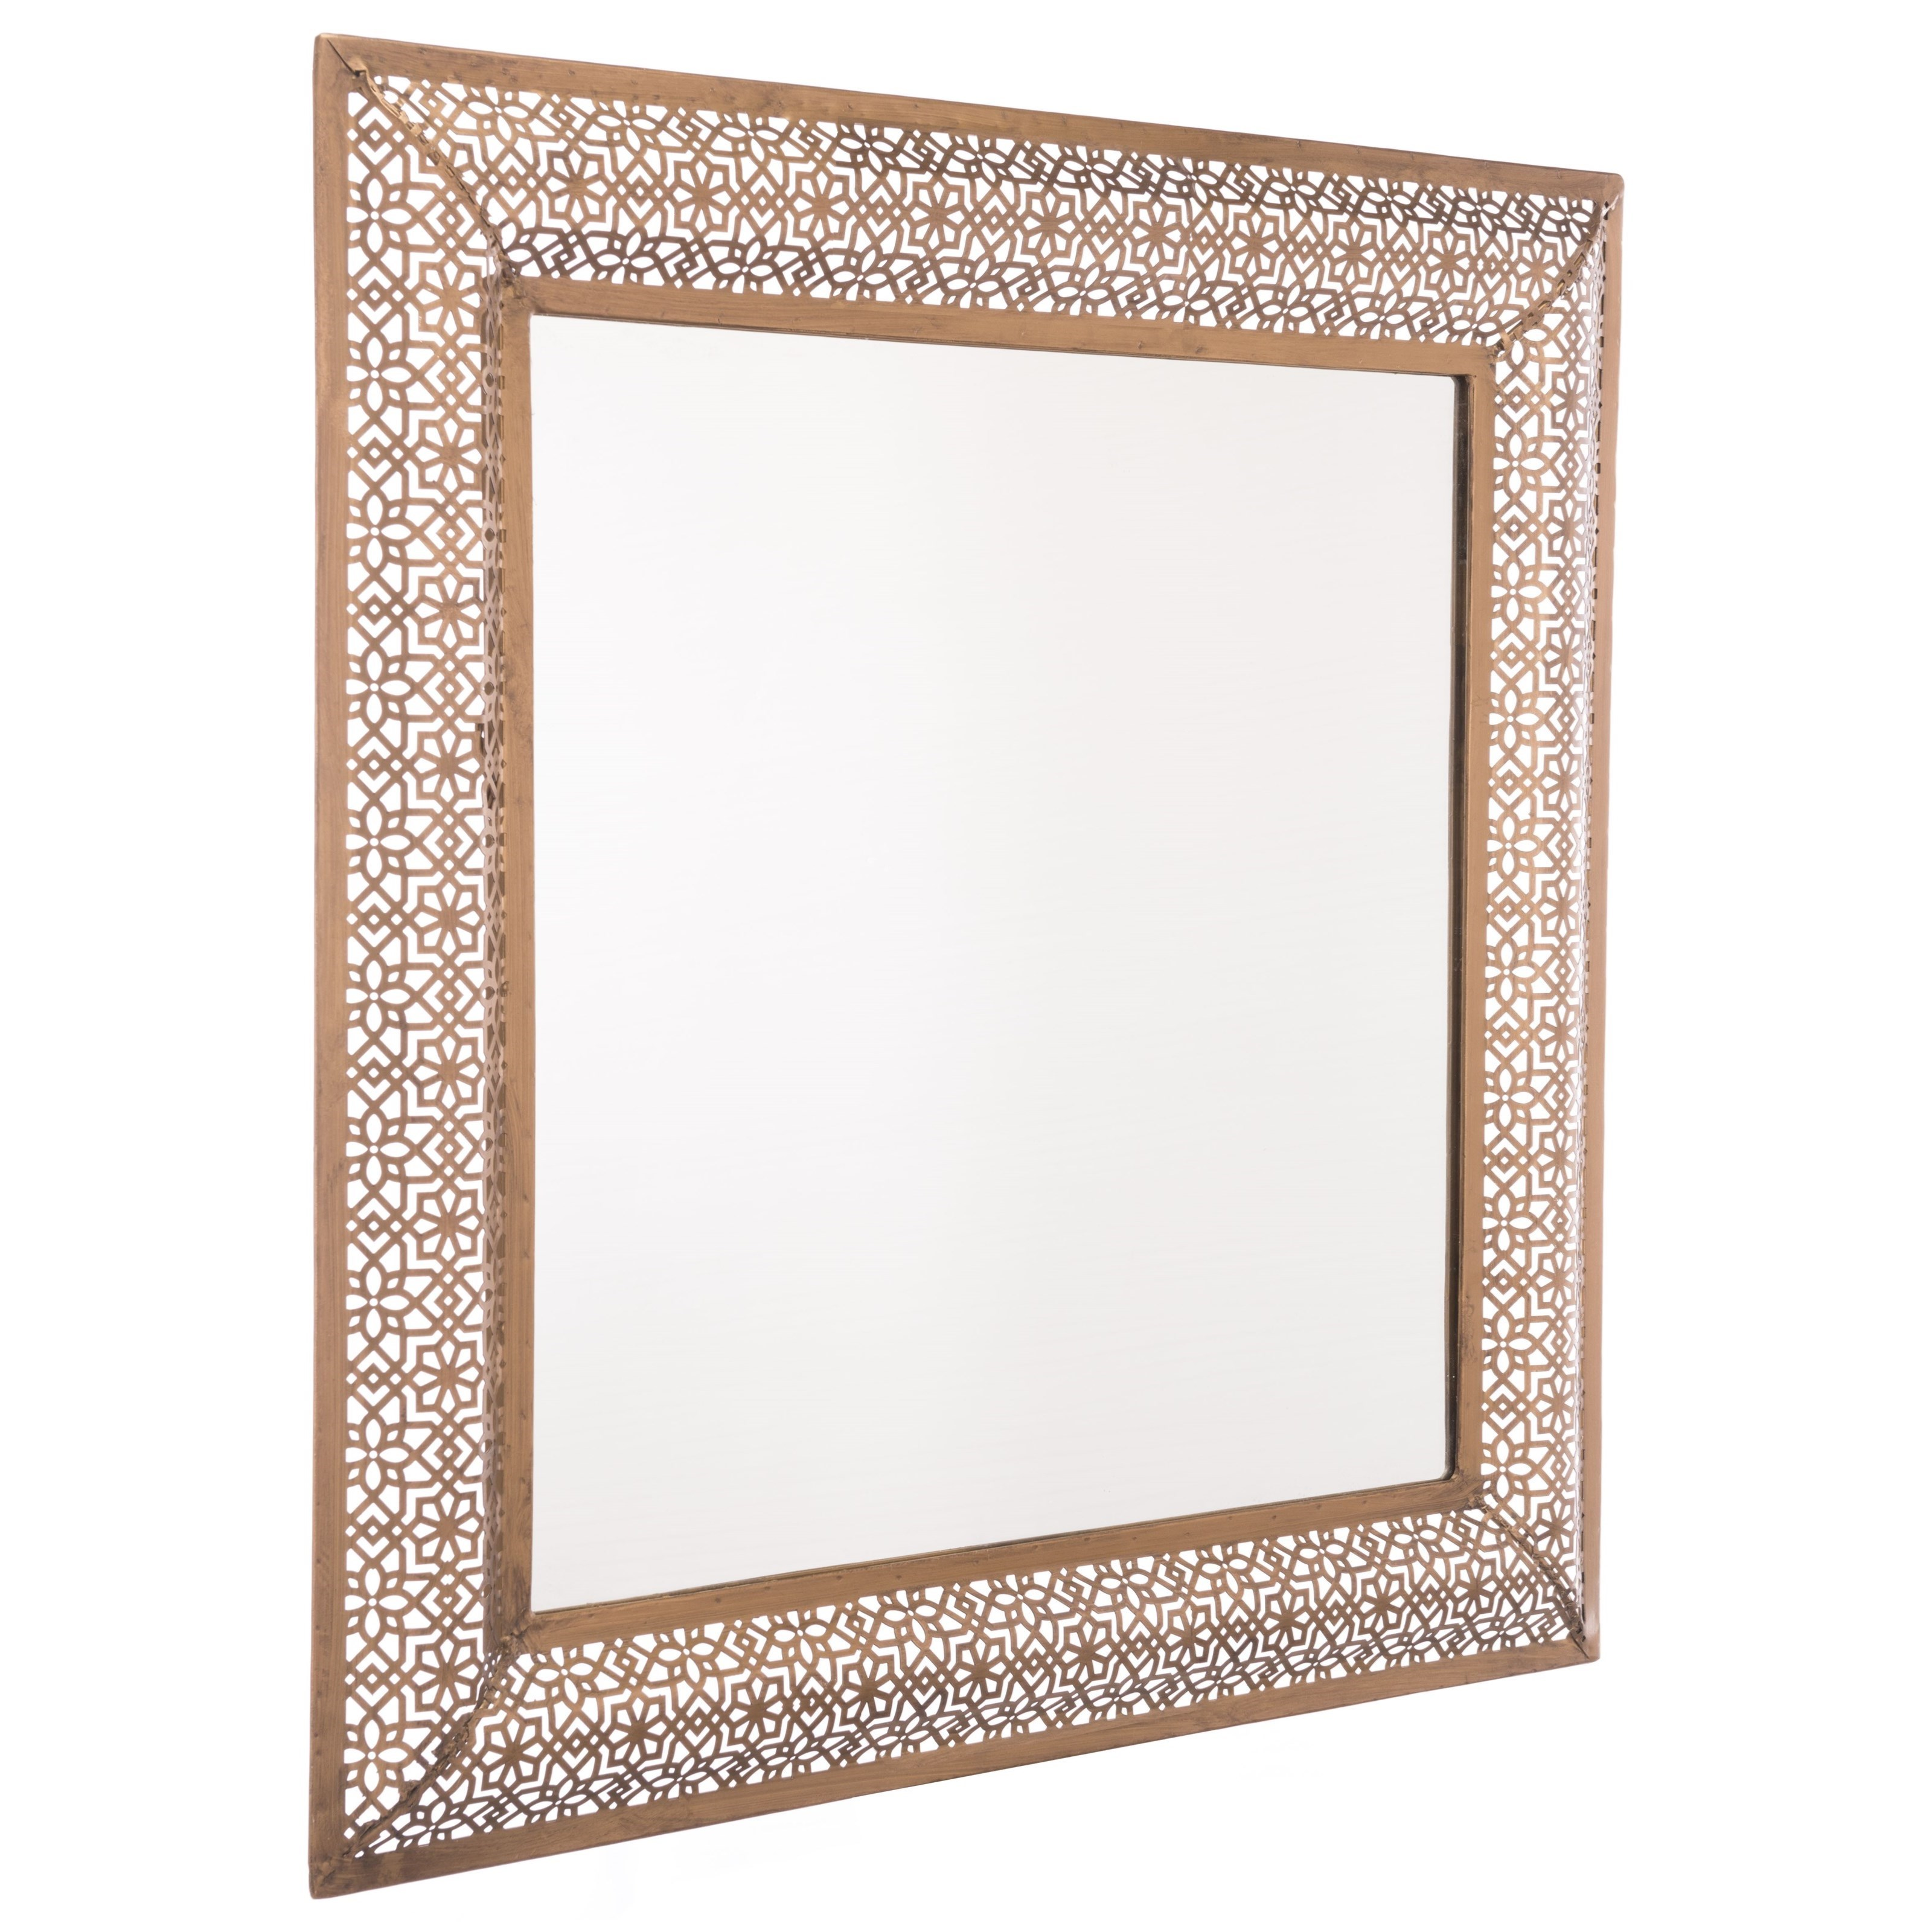 Zuo Mirrors Moroccan Escamas Mirror - Item Number: A10724